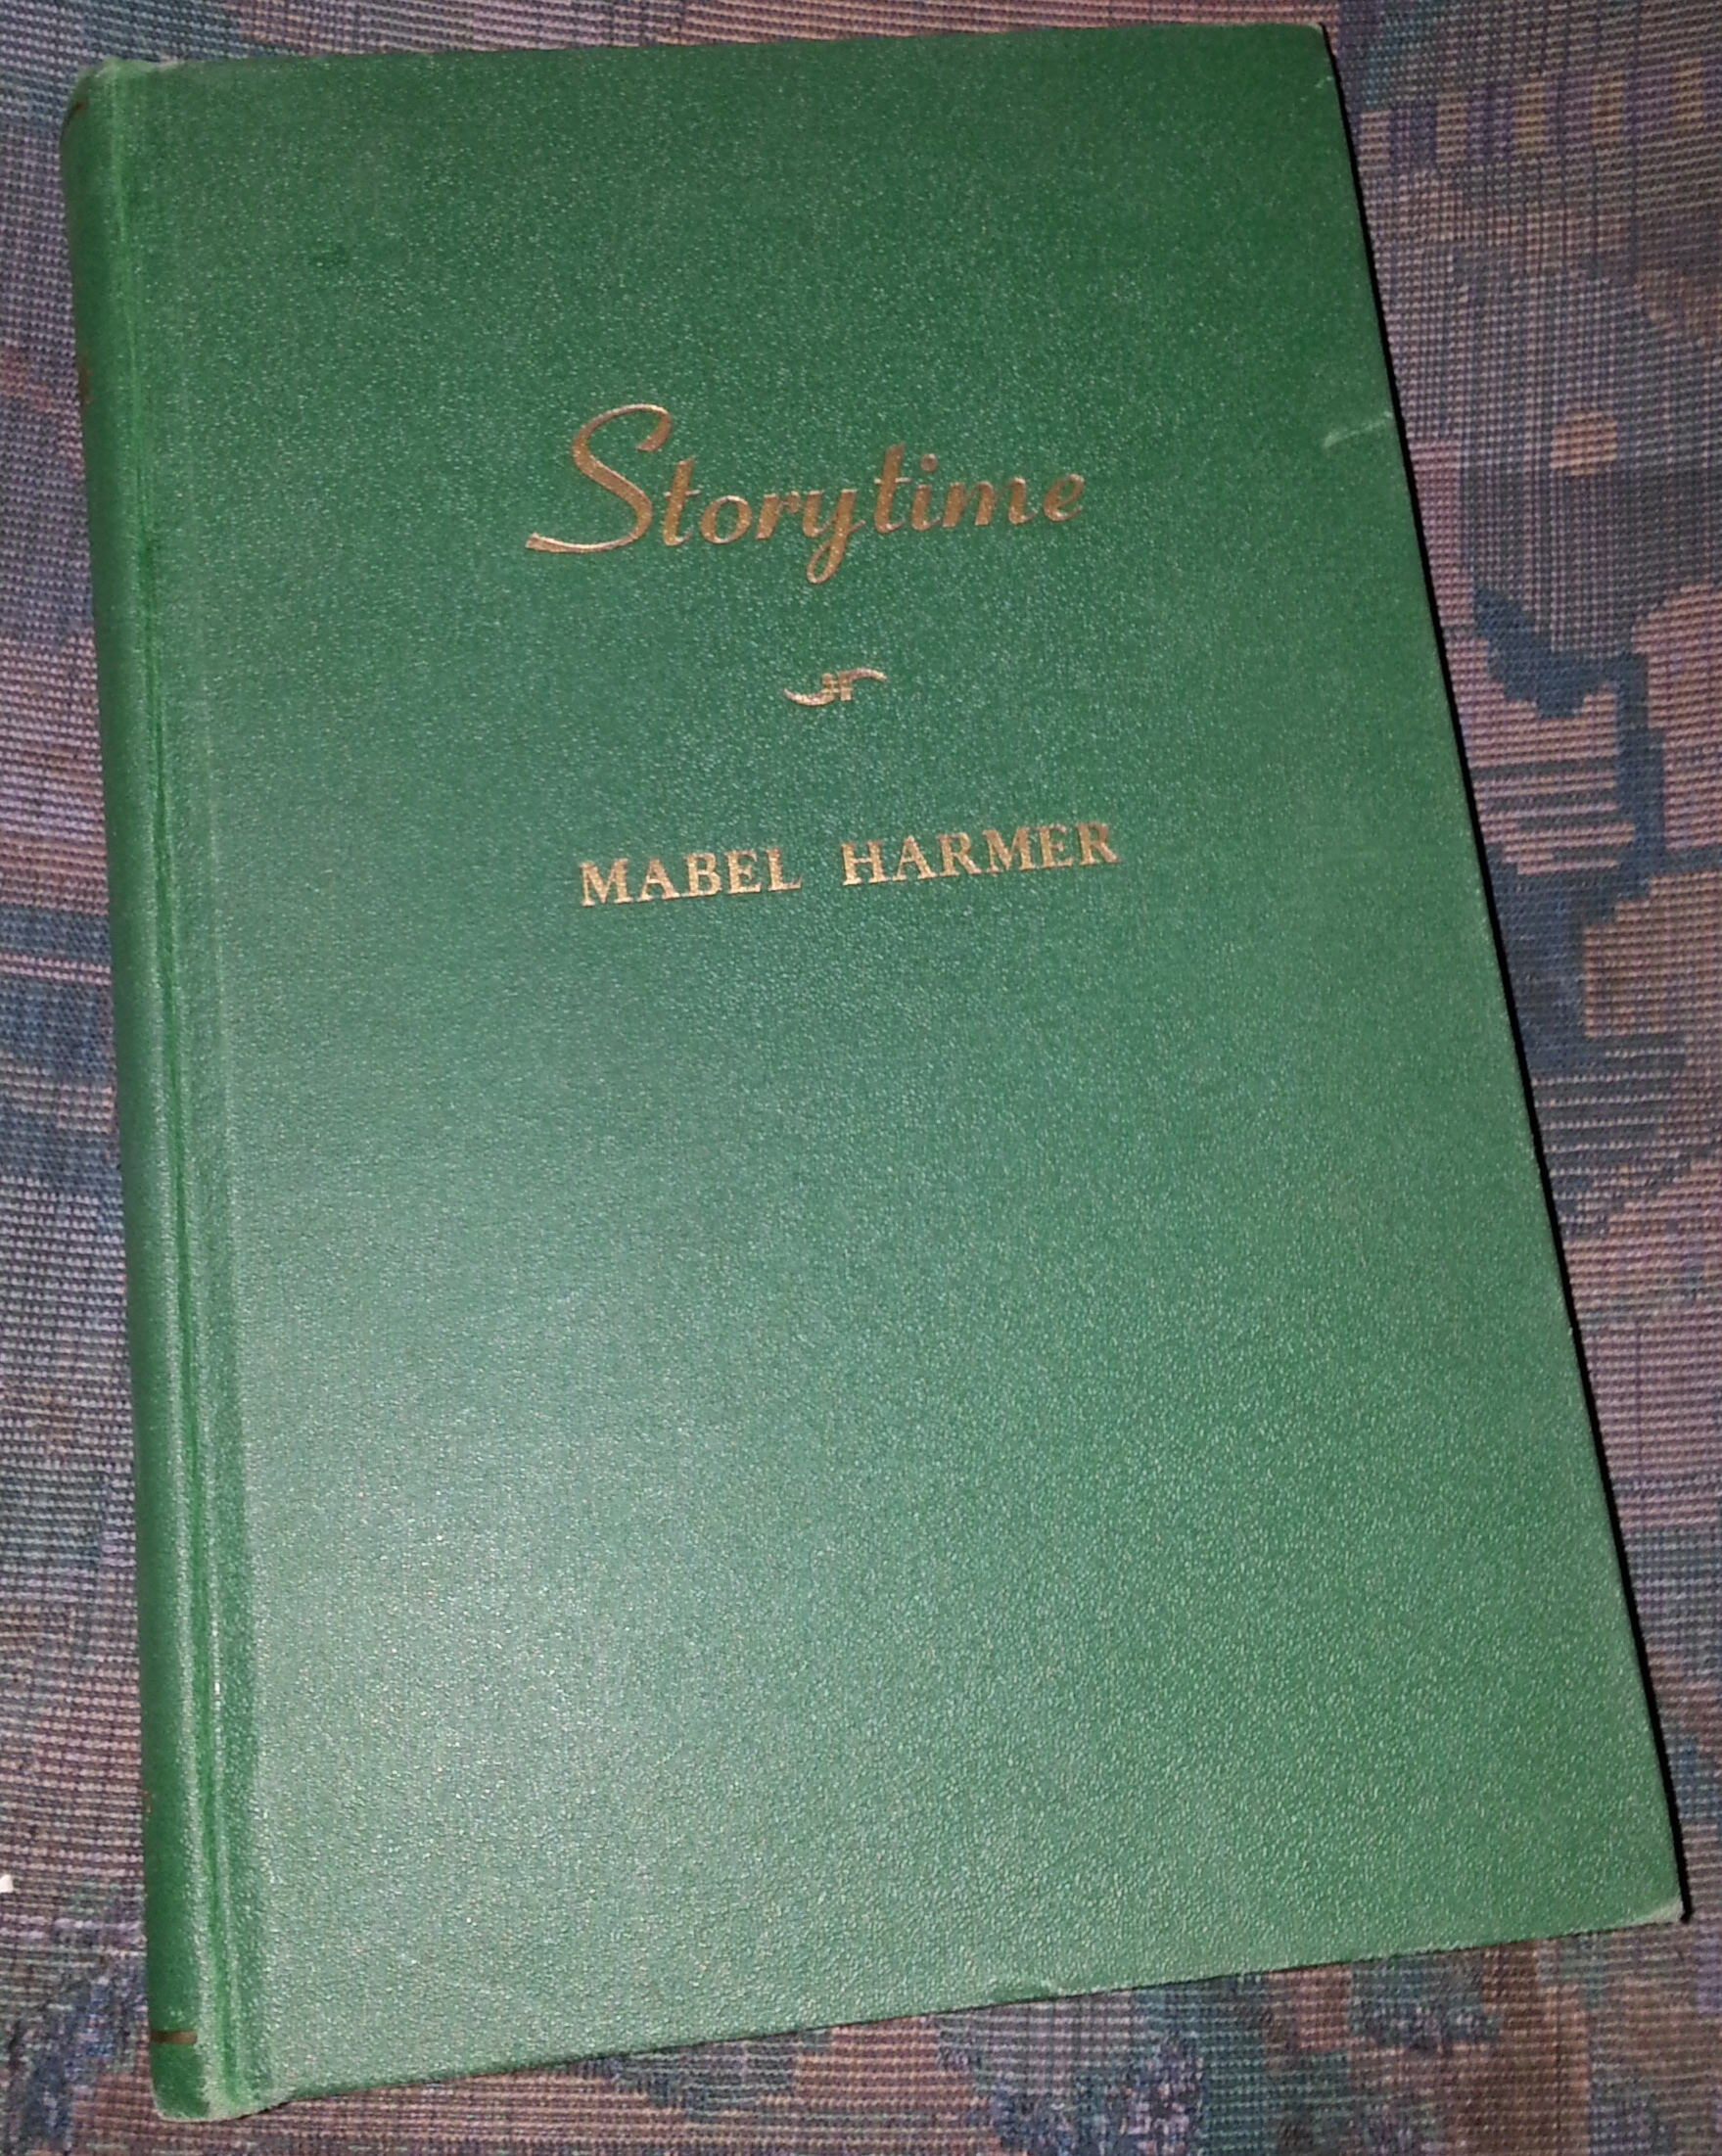 STORYTIME, Harmer, Mabel